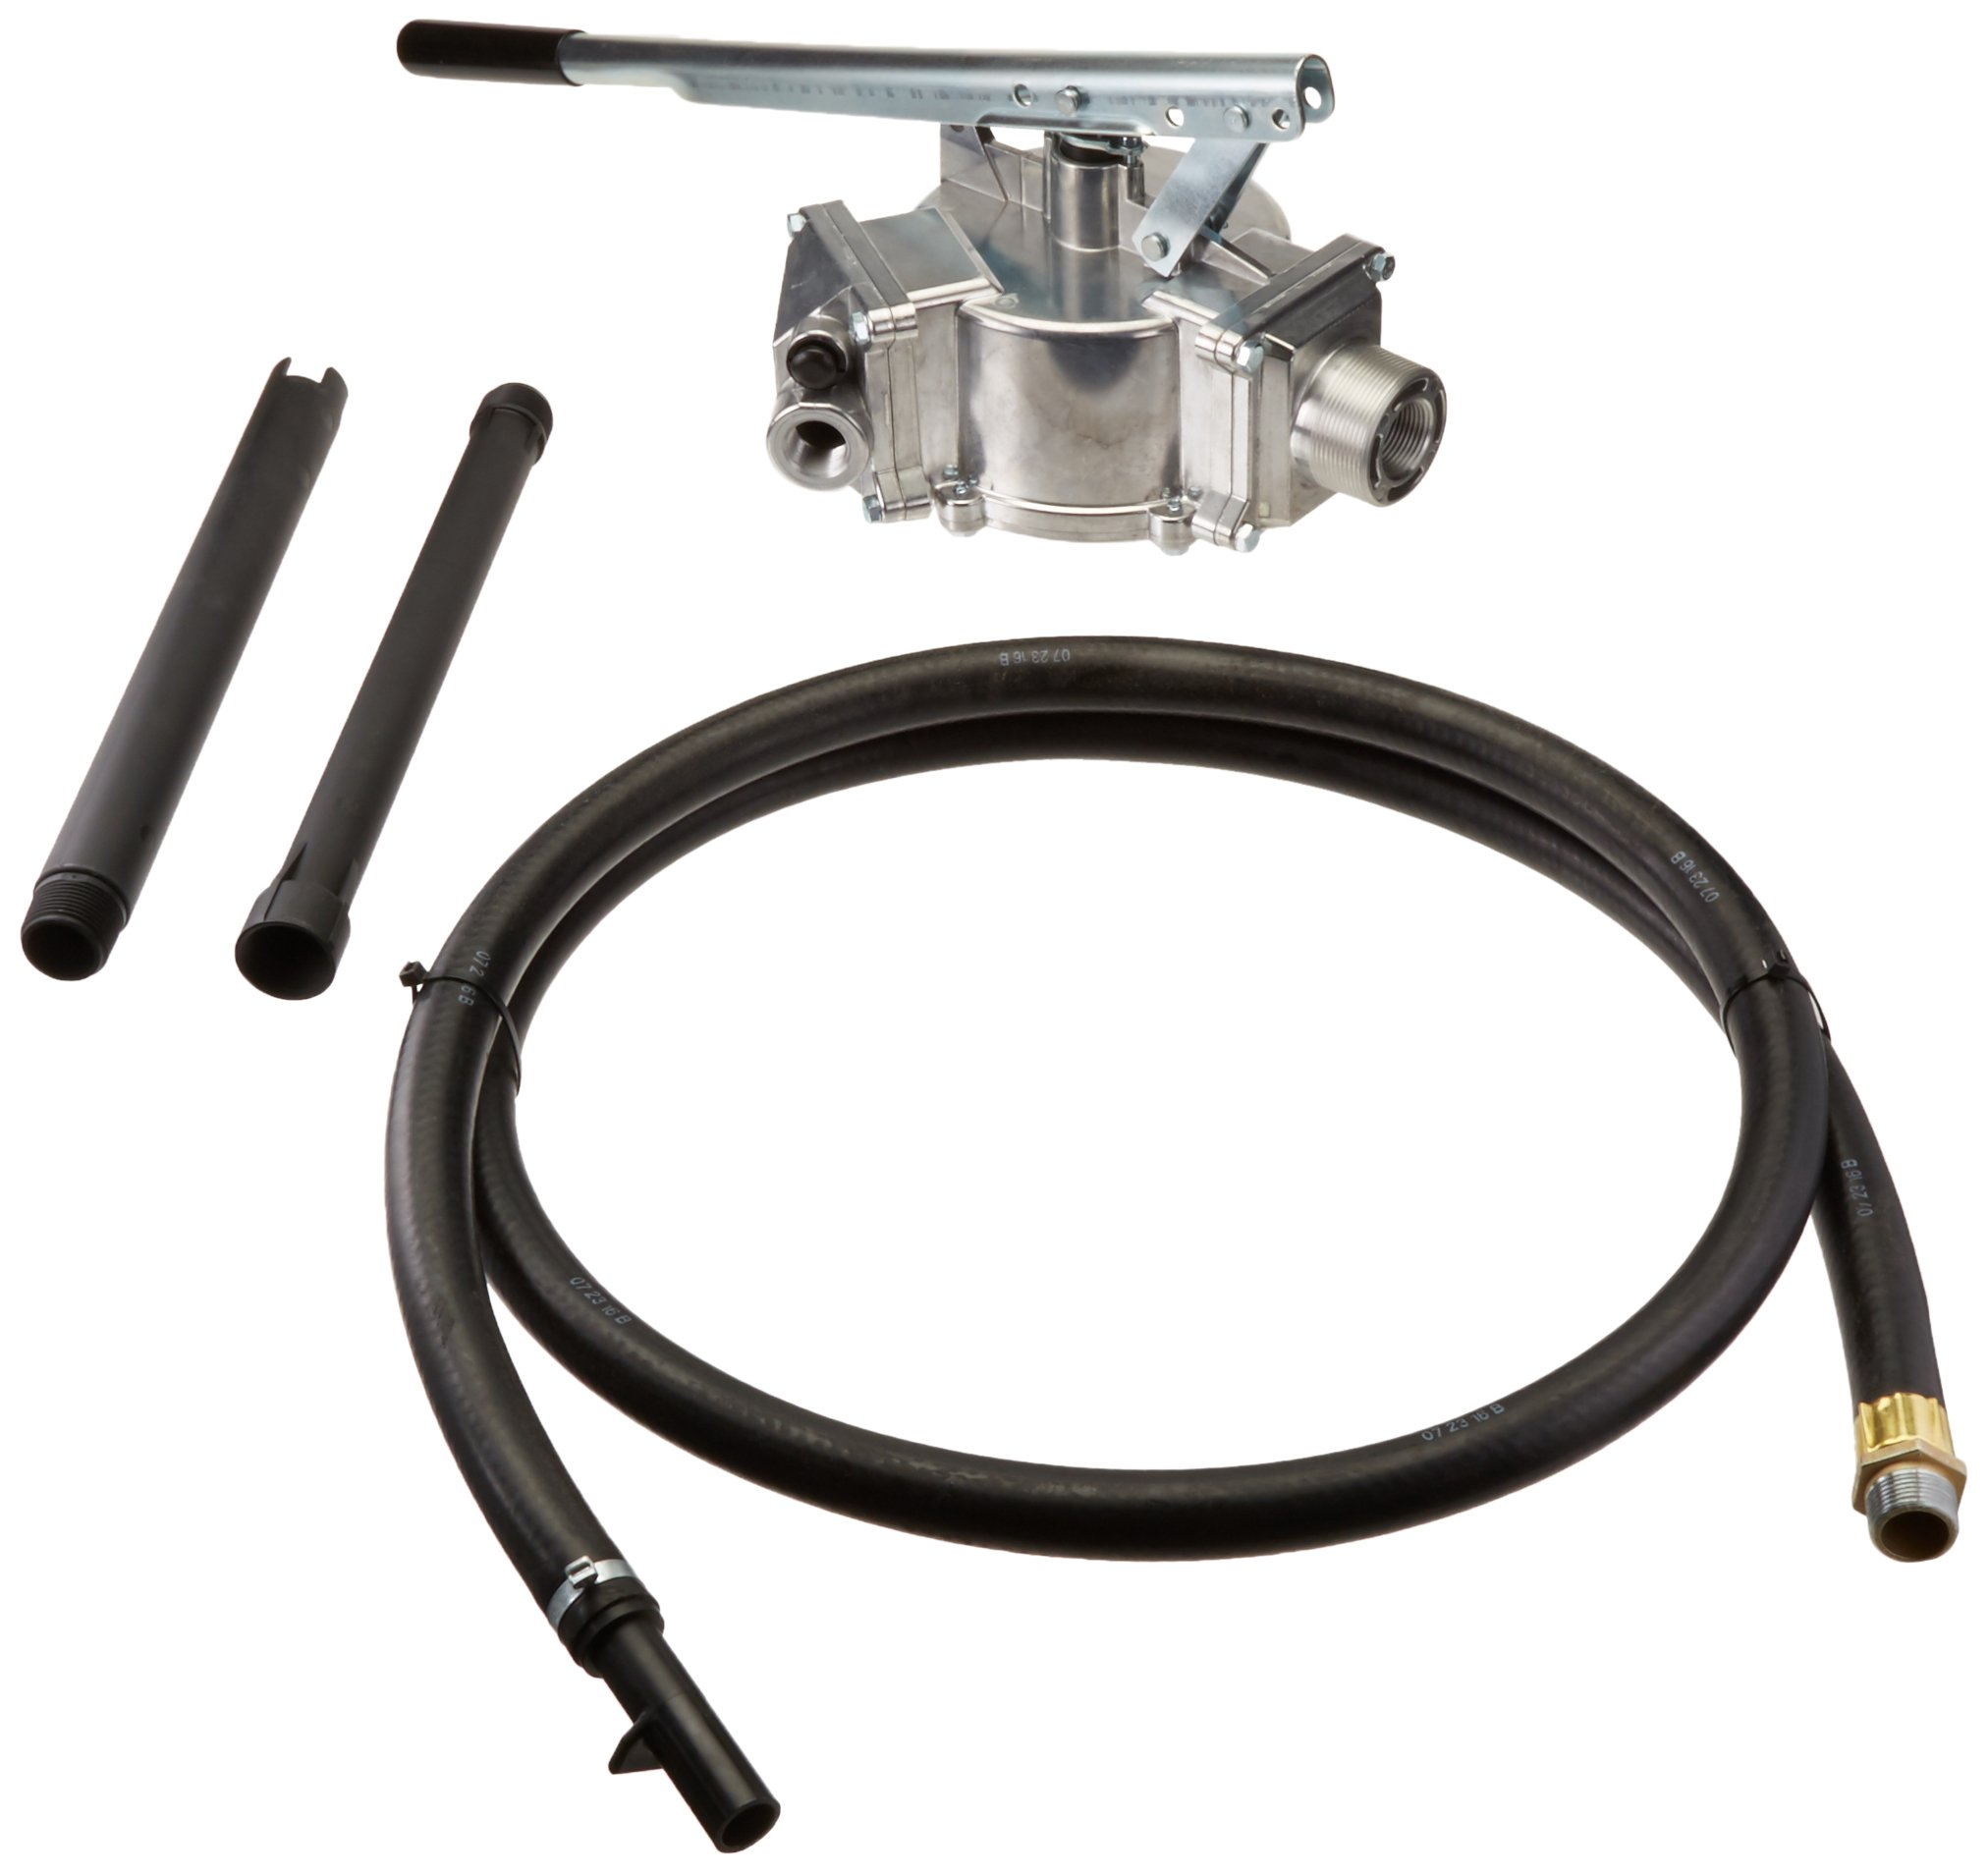 GPI 114000-5 Aluminum HP-100-NUL Hand Pump, 50 Gallons per 100 Strokes, 3/4'' Diameter 8' Hose